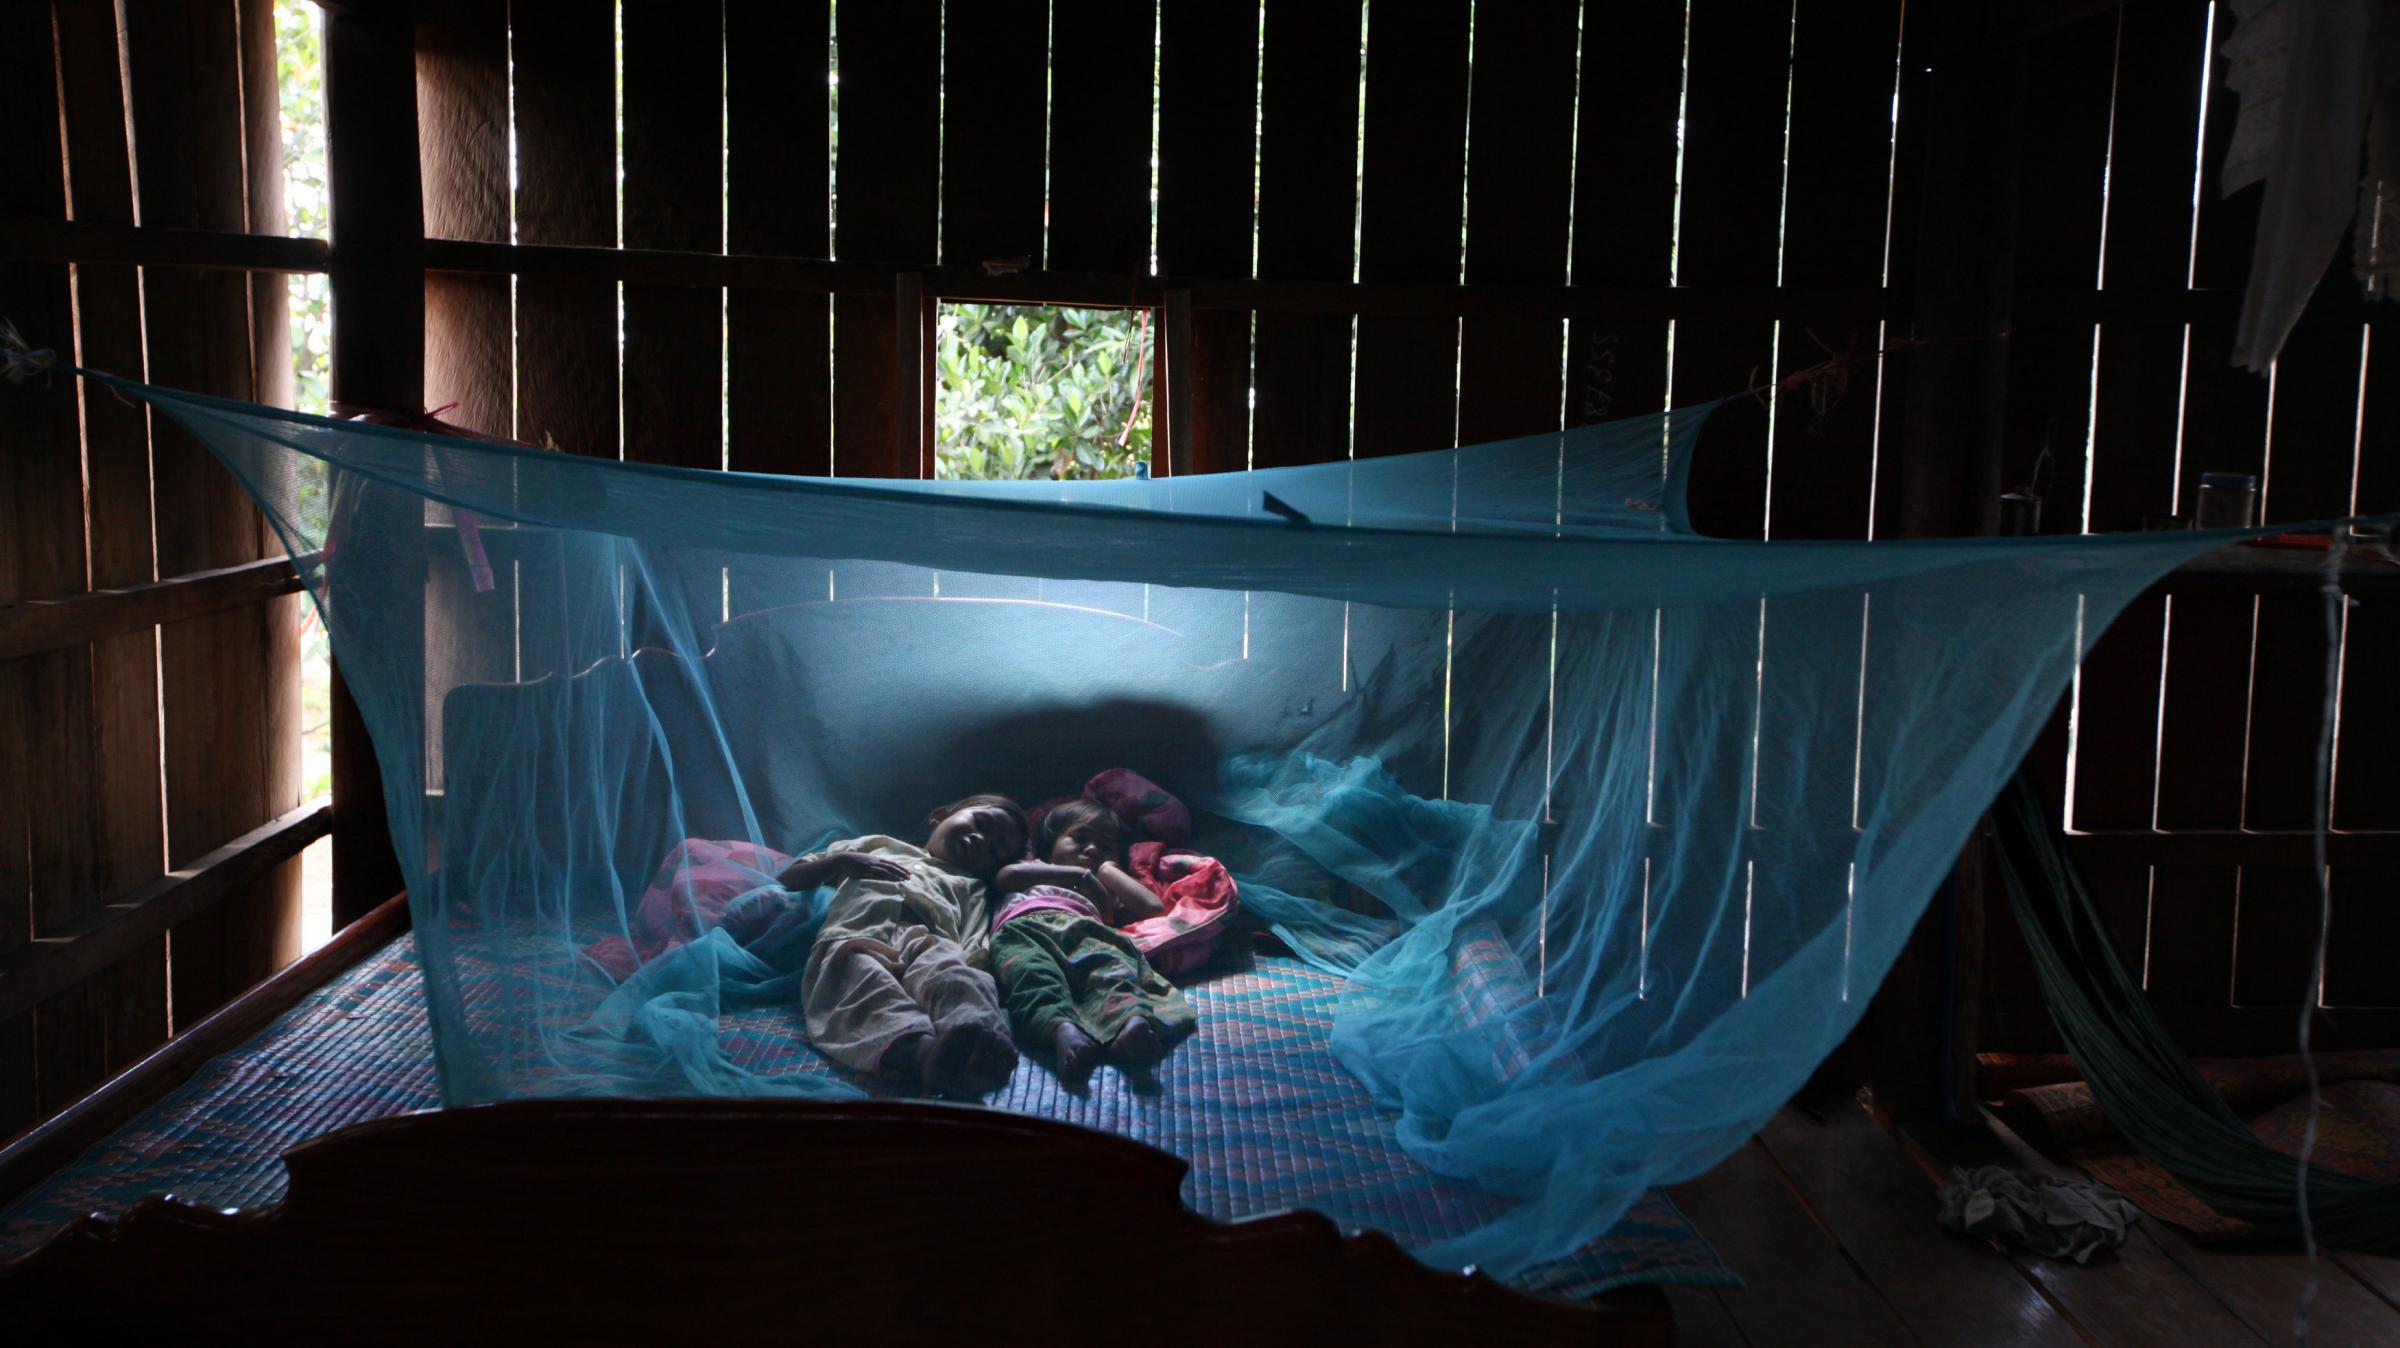 anti-malarial bednet